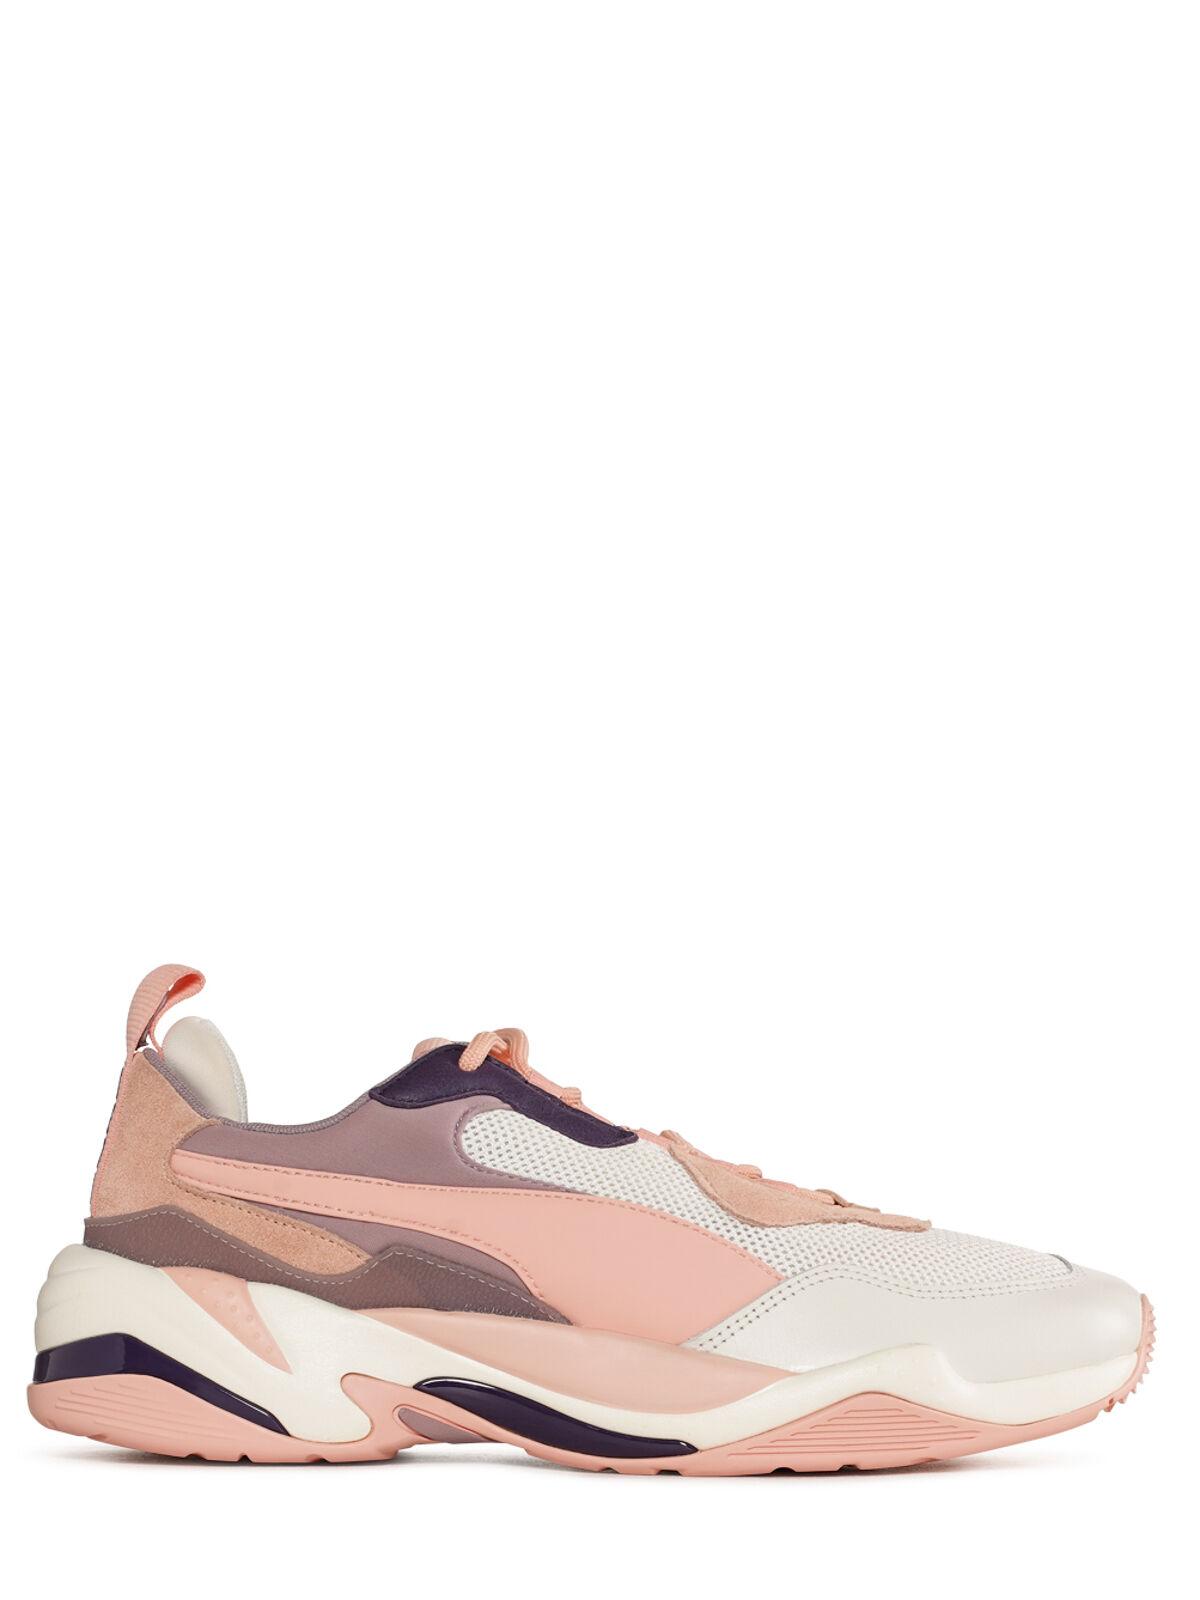 Puma Sneaker Thunder Spectra weiß/rosa